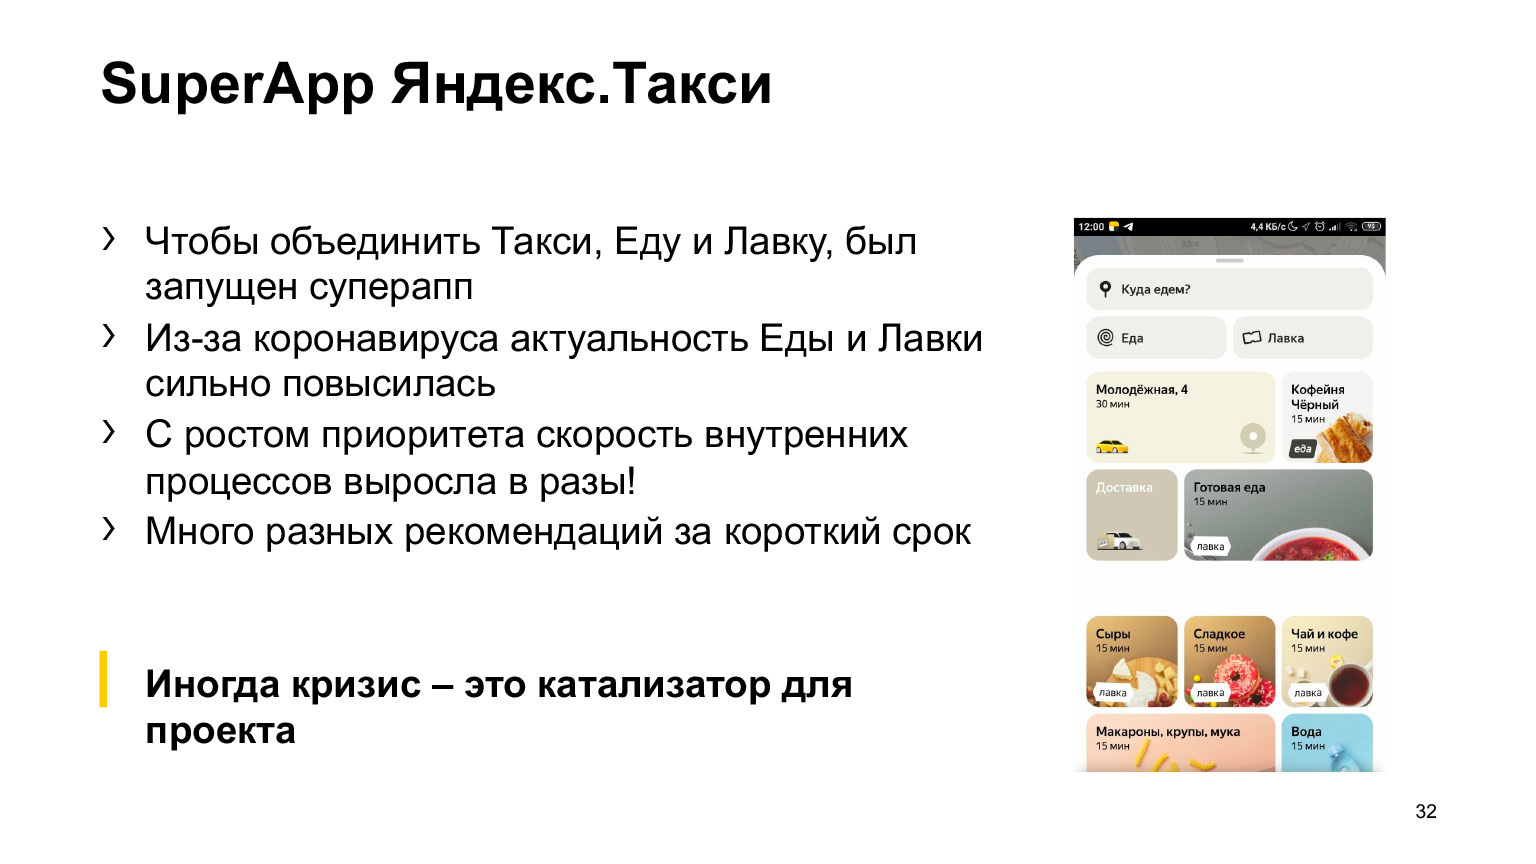 Как коронавирус повлиял на ML-проекты Такси, Еды и Лавки. Доклад Яндекса - 11